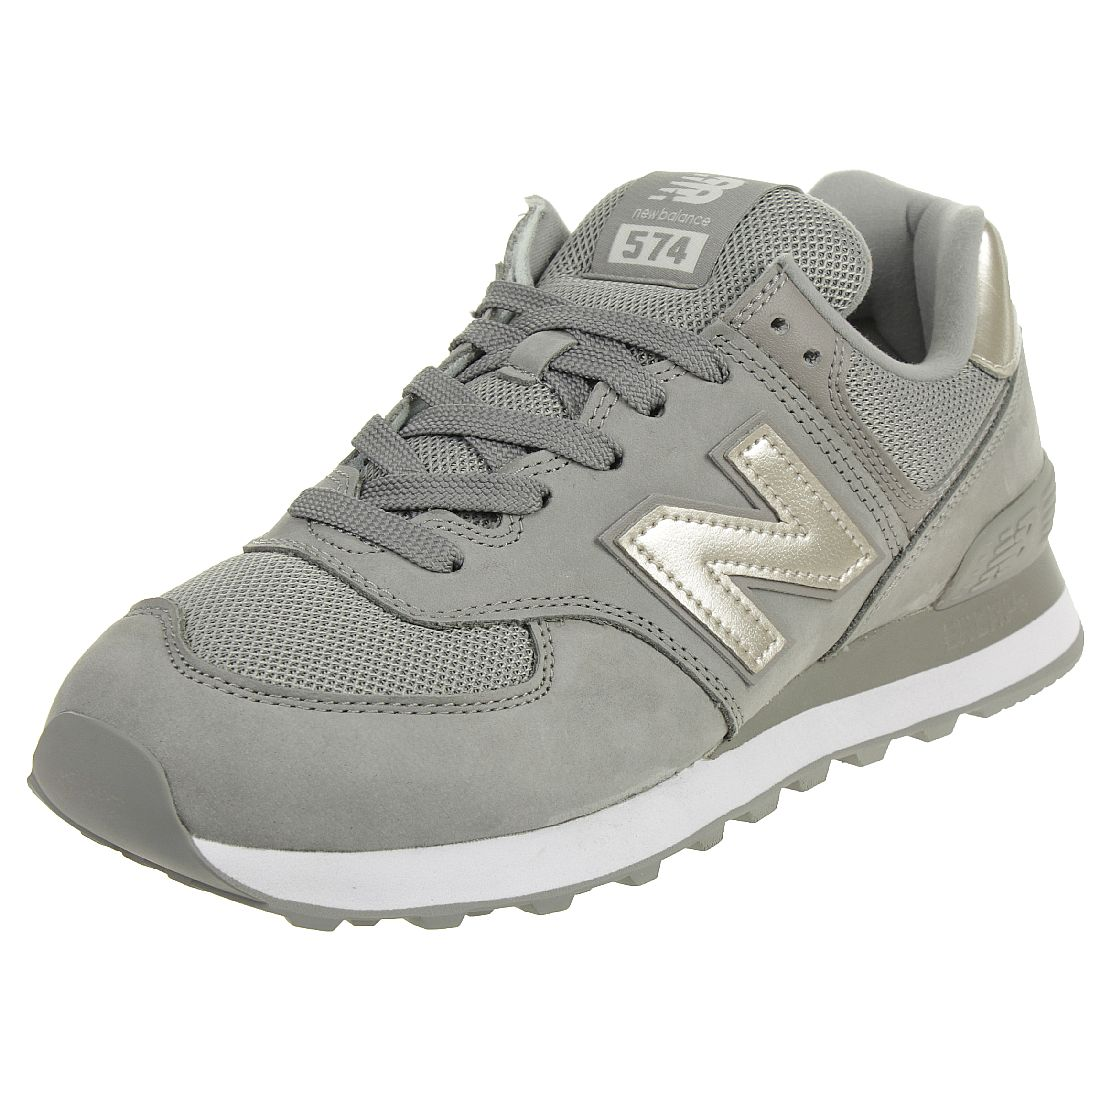 New Balance WL574 WNK Classic Sneaker Damen Schuhe grau ...